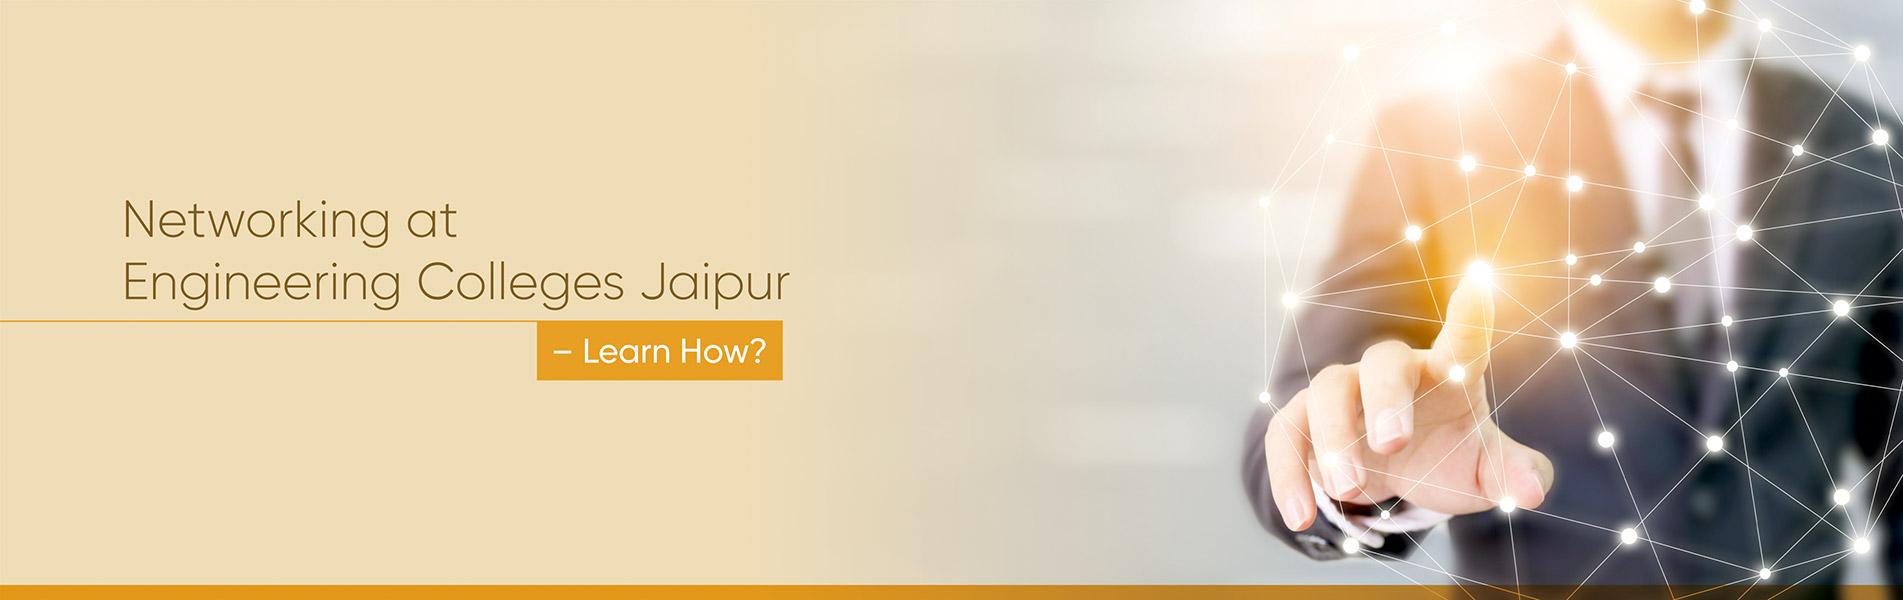 Networking at Engineering College Jaipur